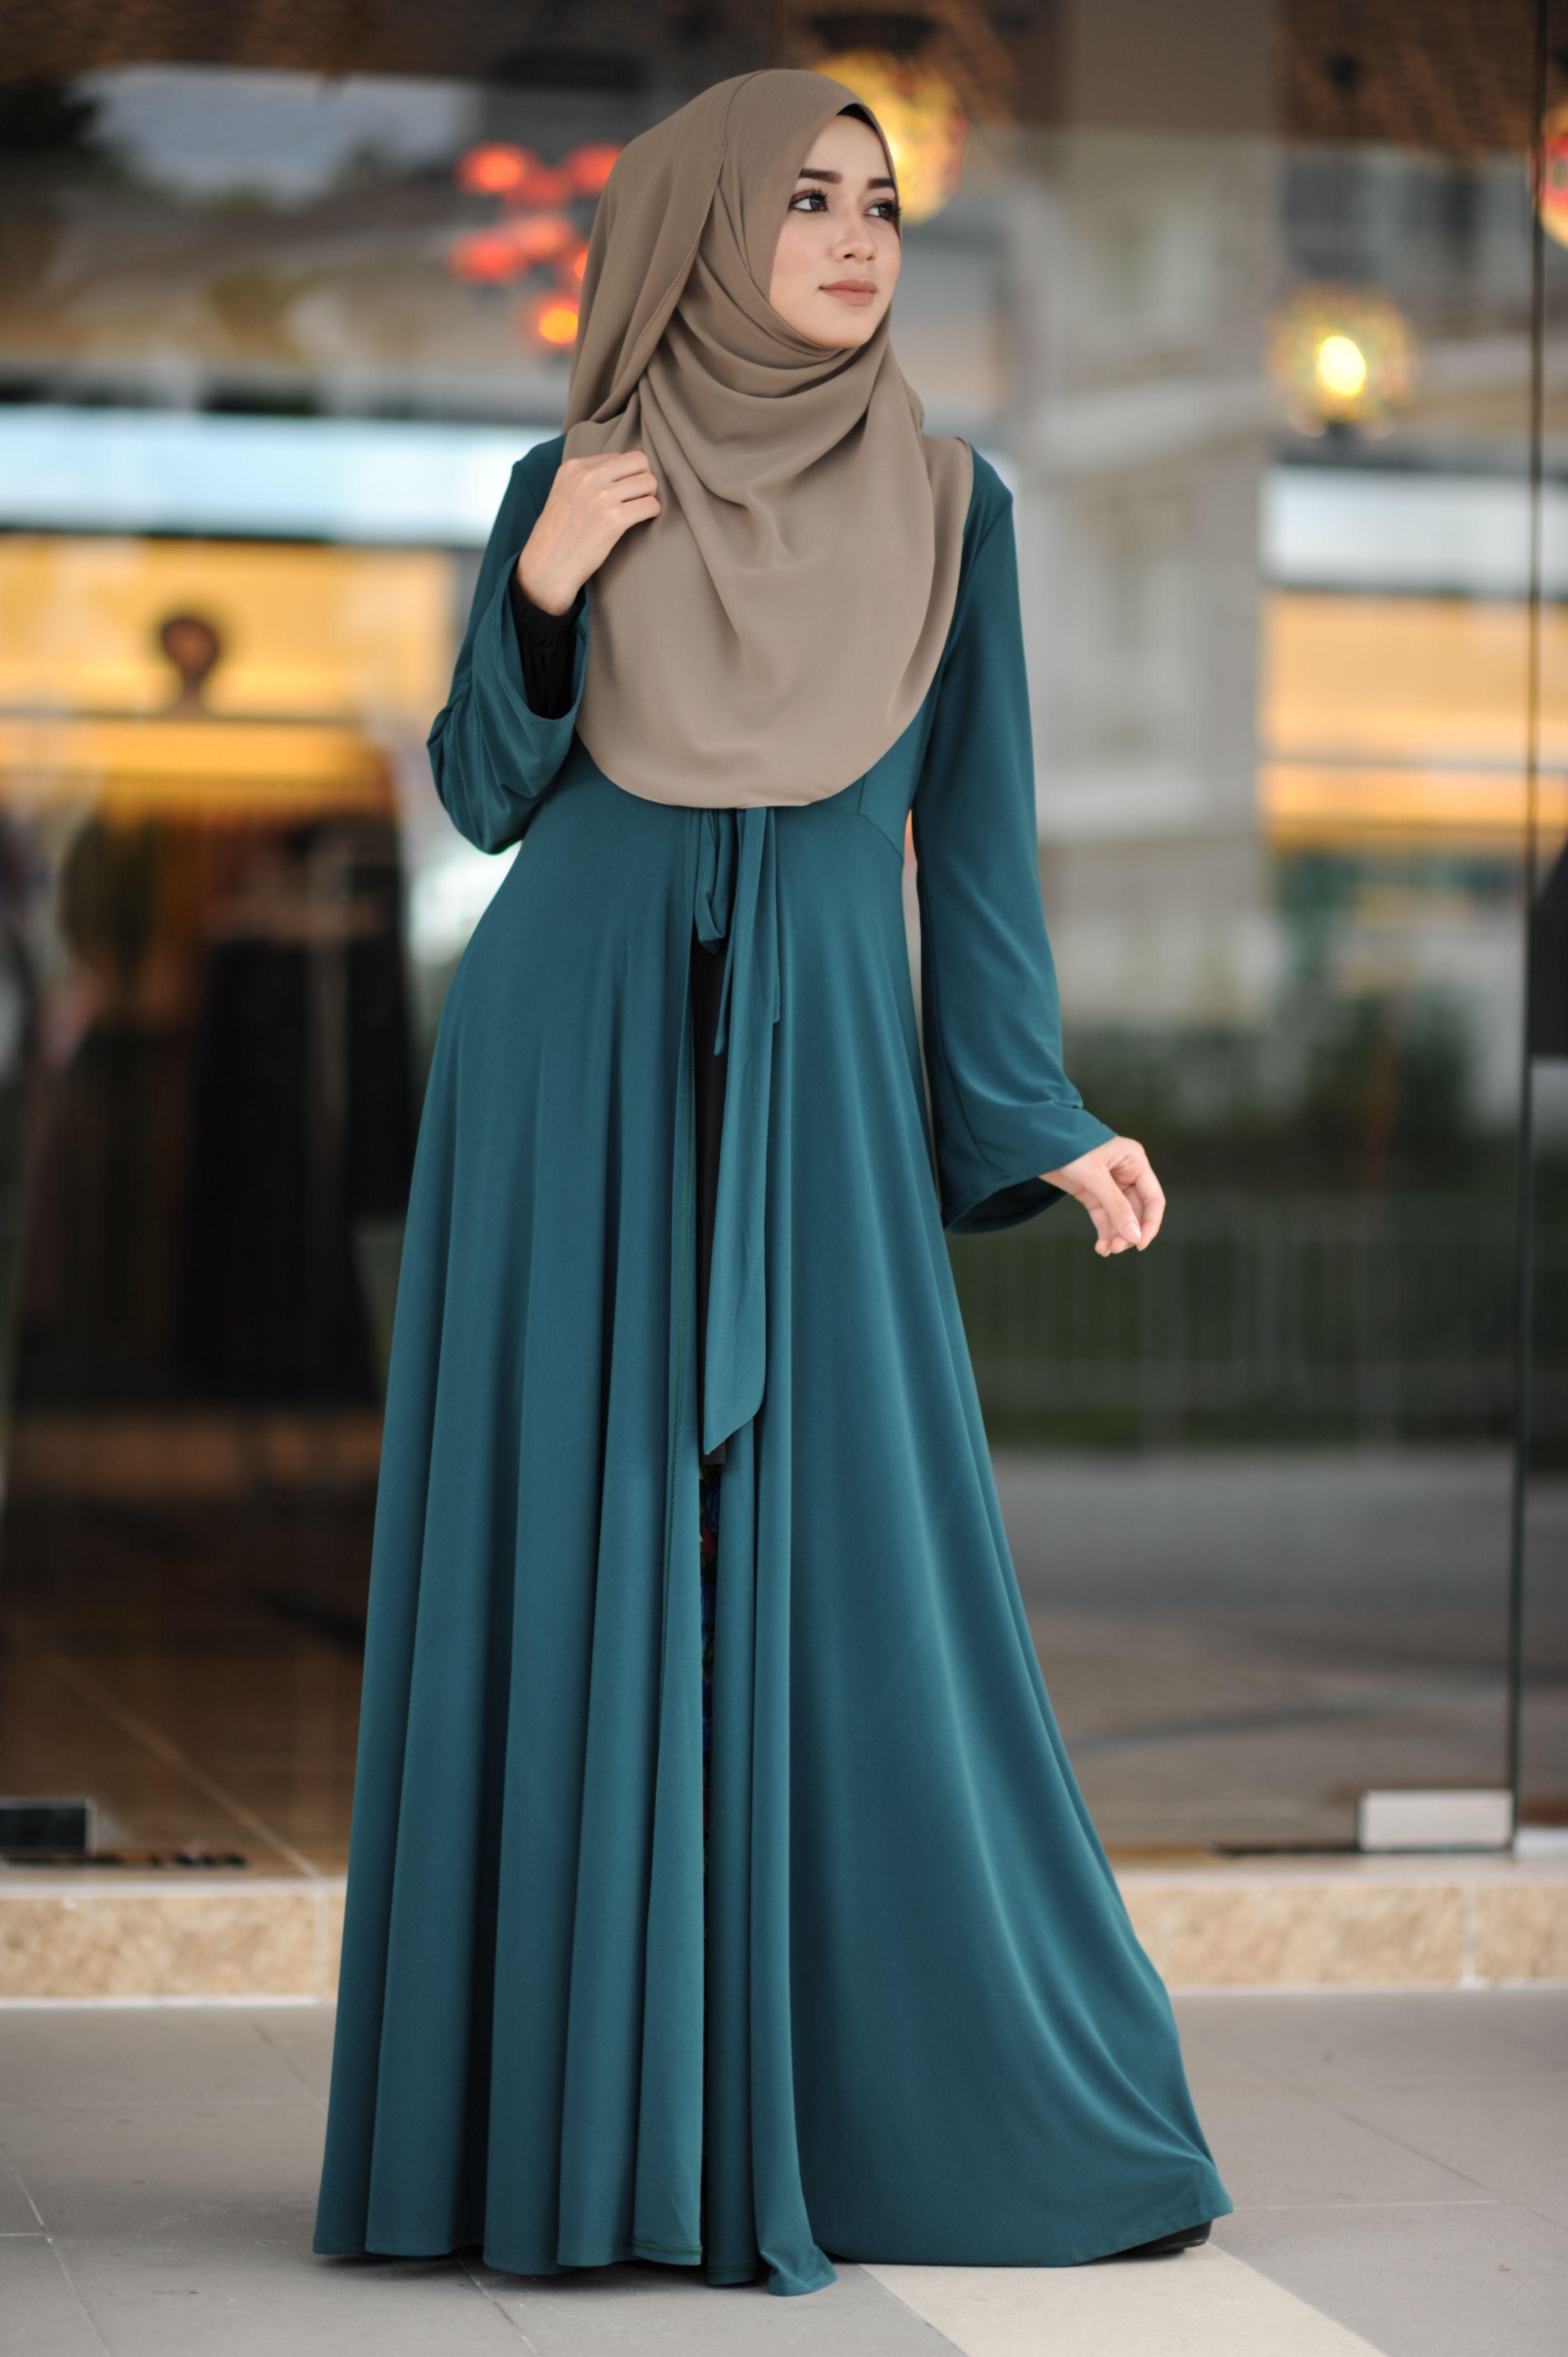 98f3a5840b35 Salsabeela Muslimah Attire Boutique in Wangsa Melawati, Kuala Lumpur ...